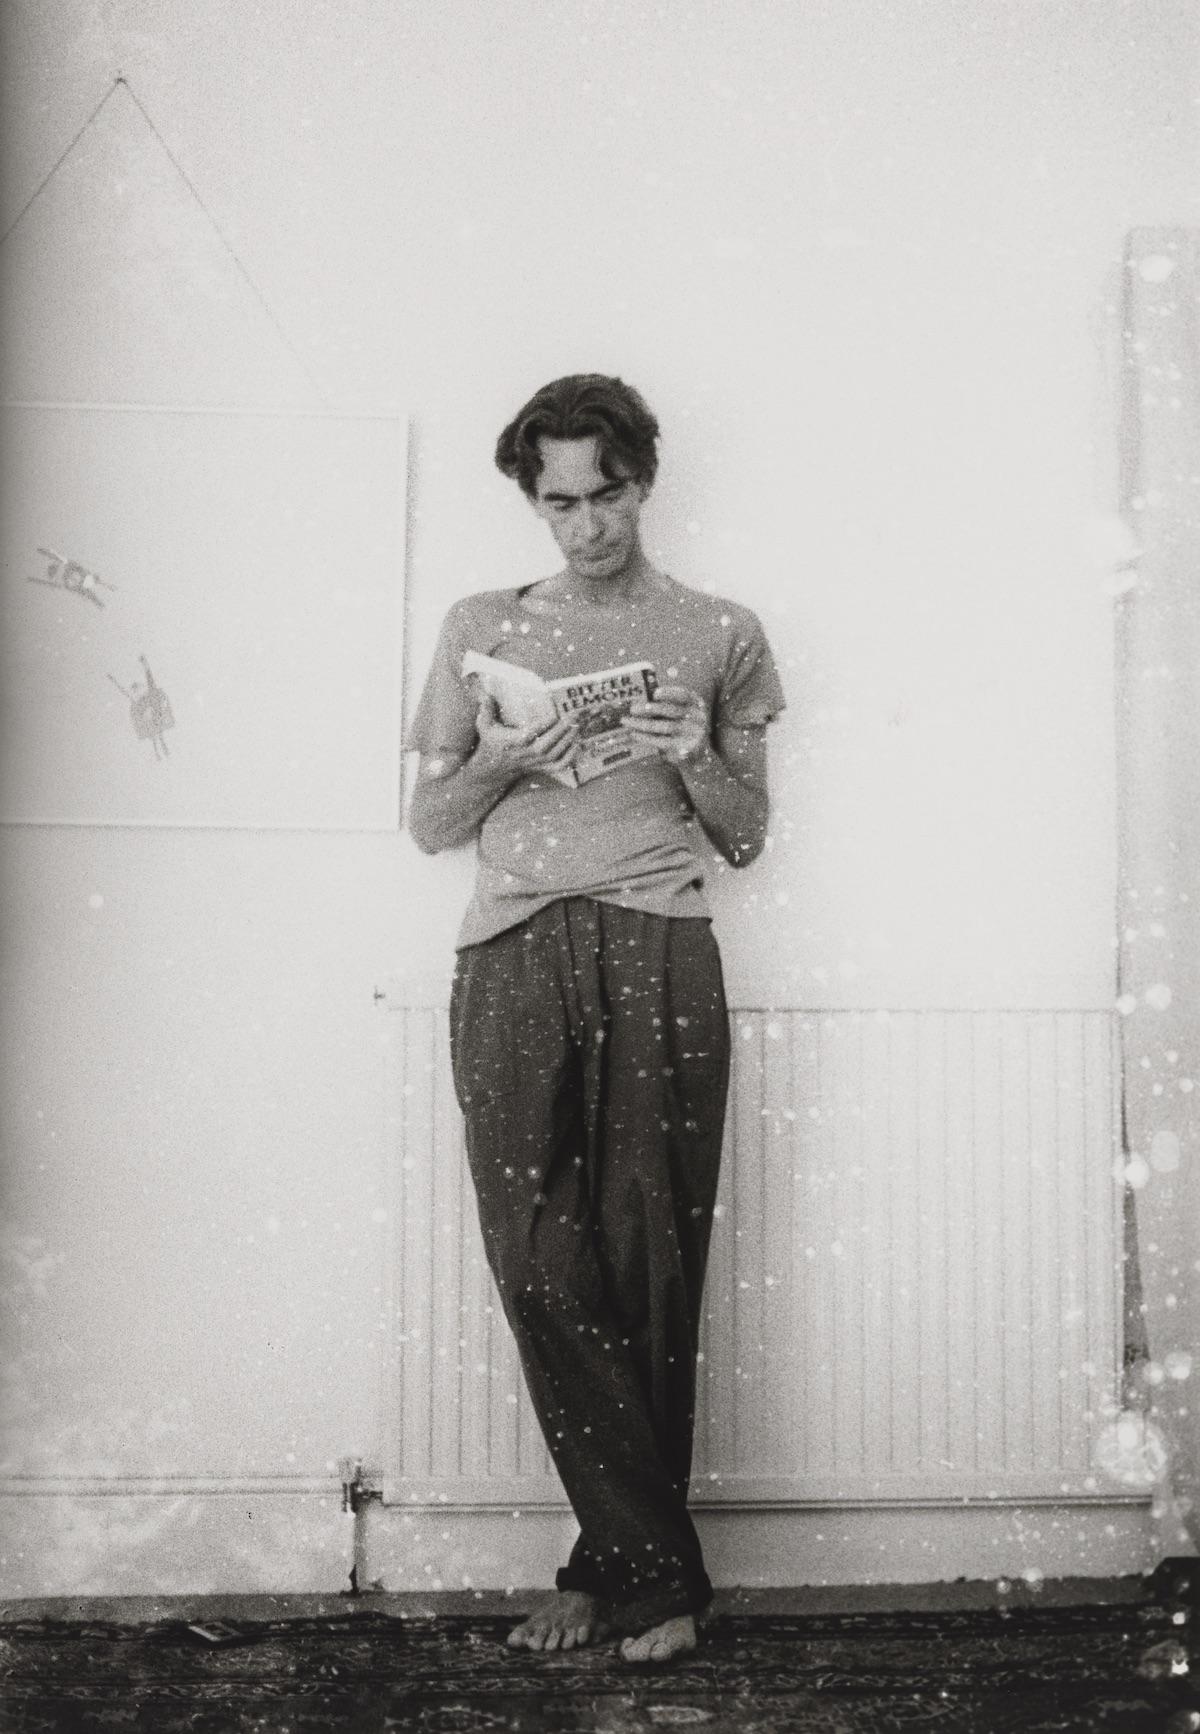 Ossie Clark David Gwinnutt National Portrait Gallery Before We Were Men Gay Queer London